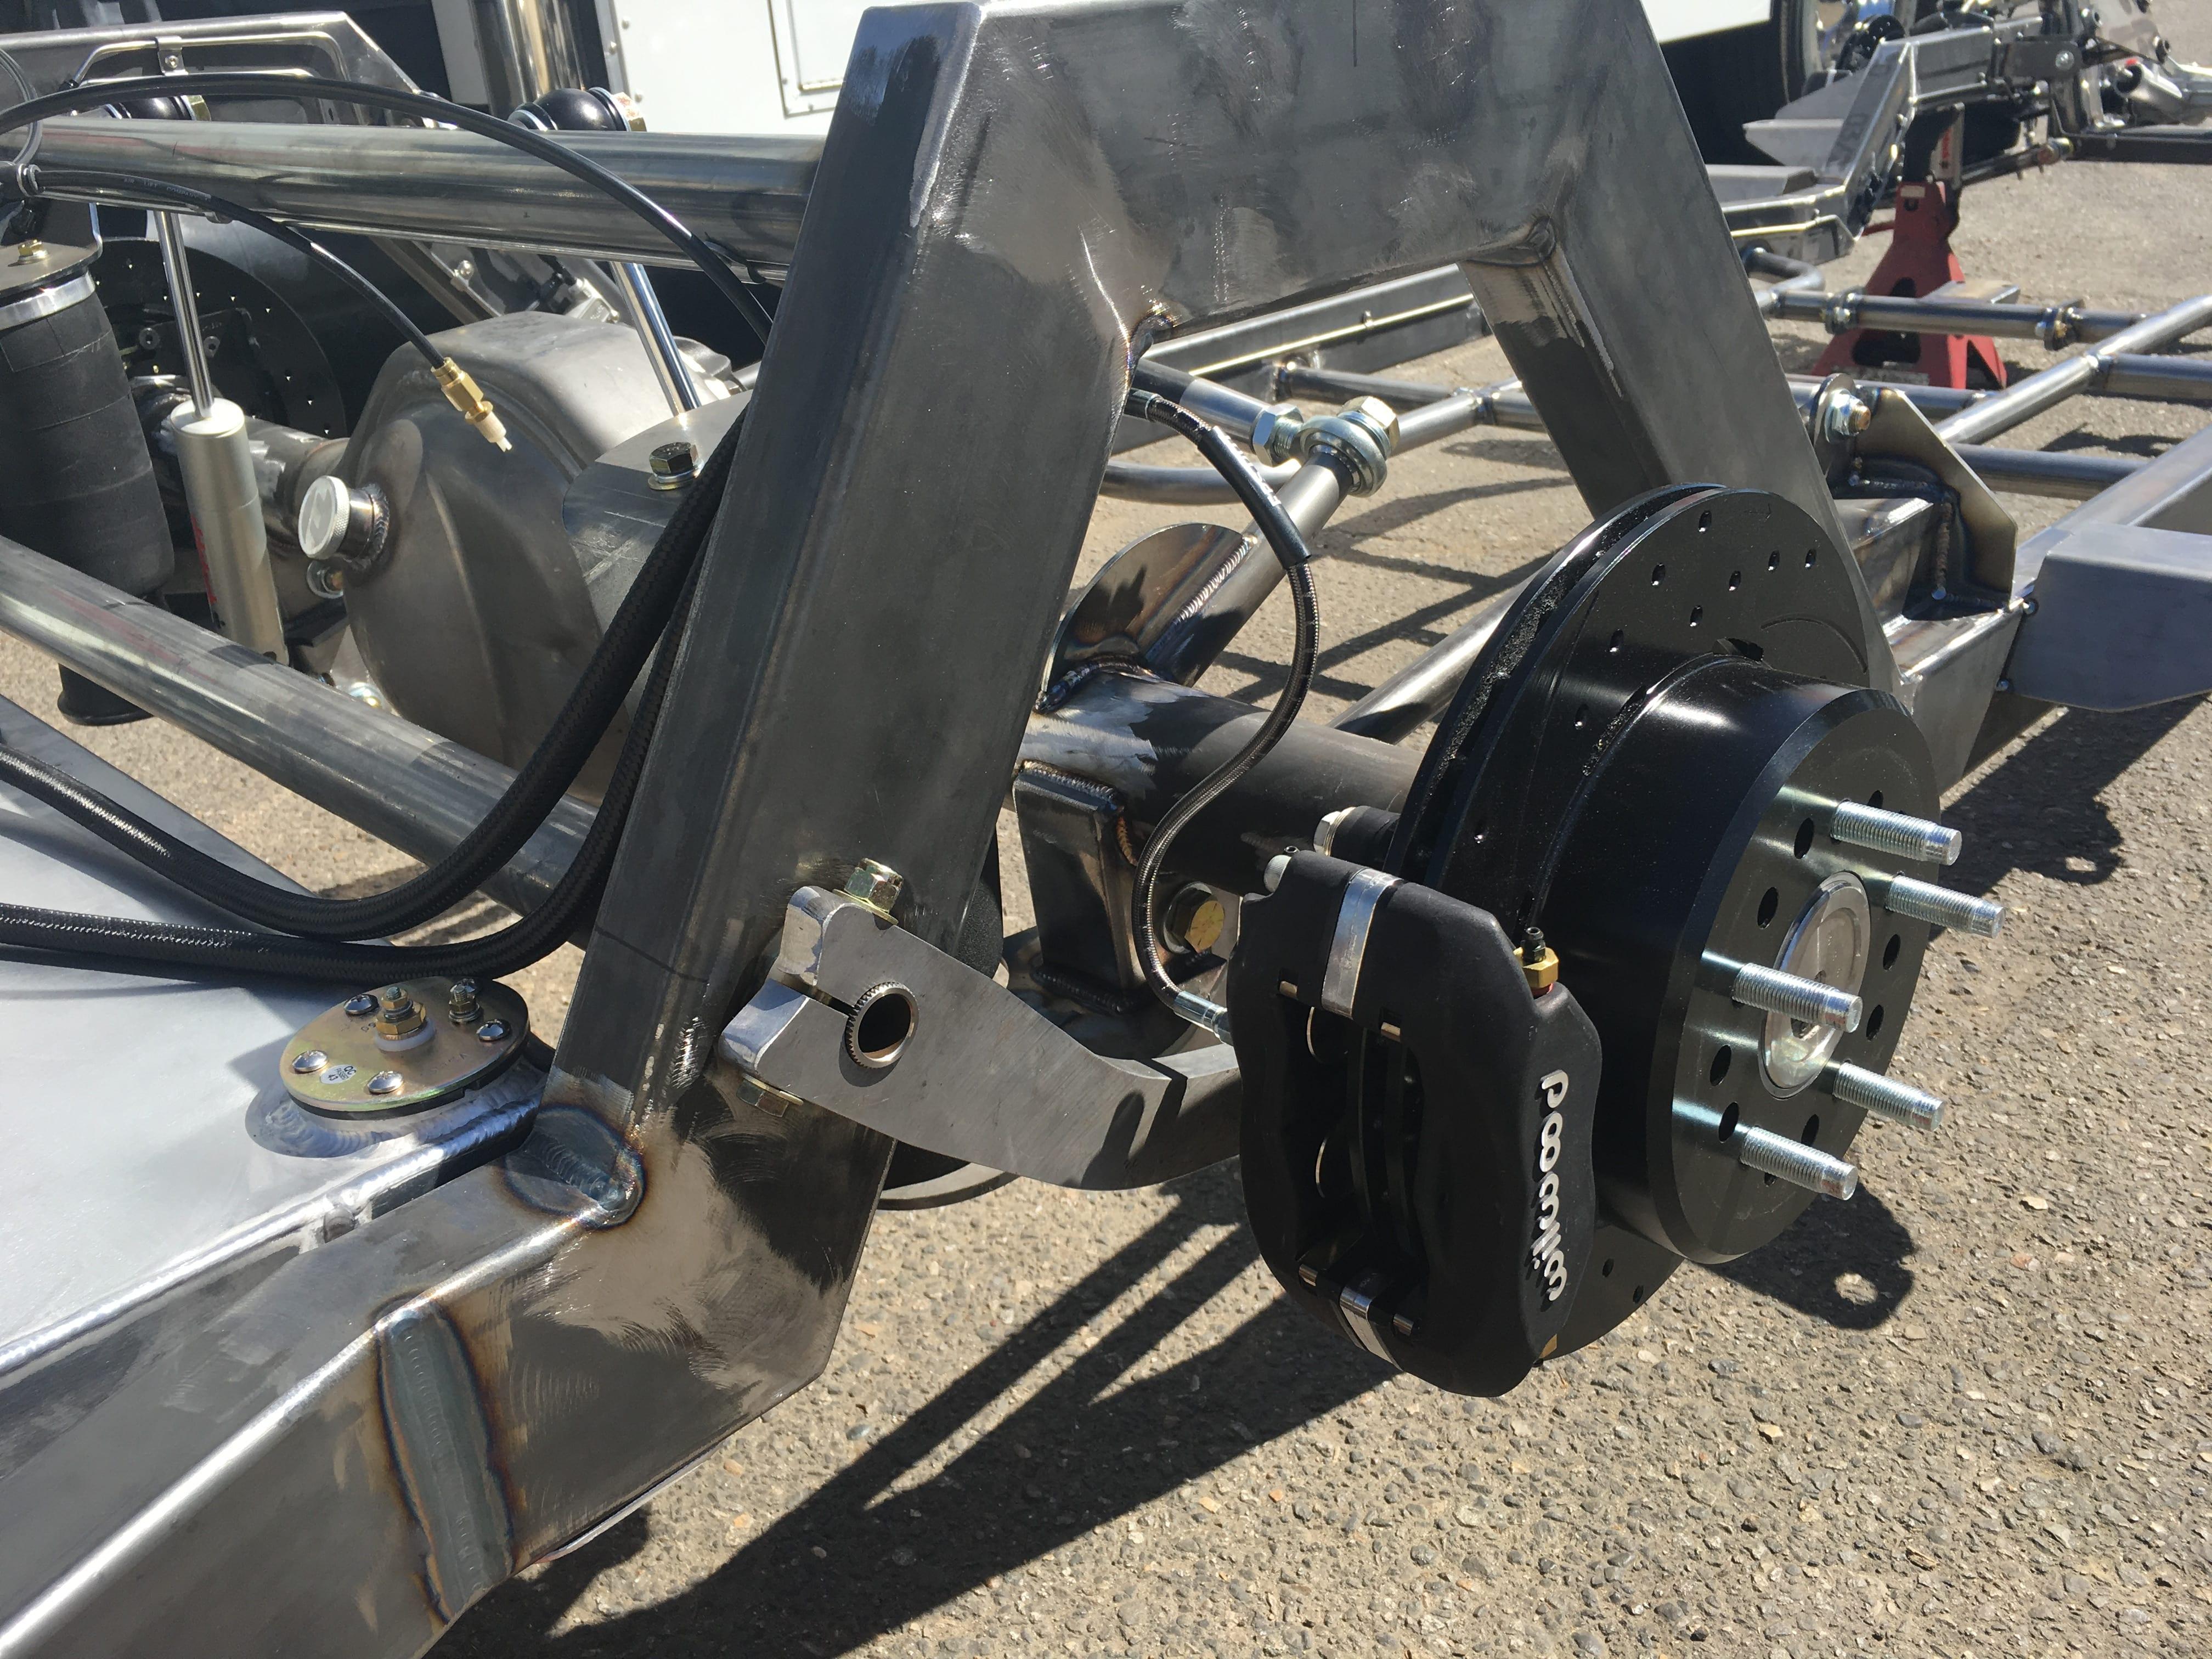 Scotts-1949-1951-Mercury-Chassis-rear-brakes